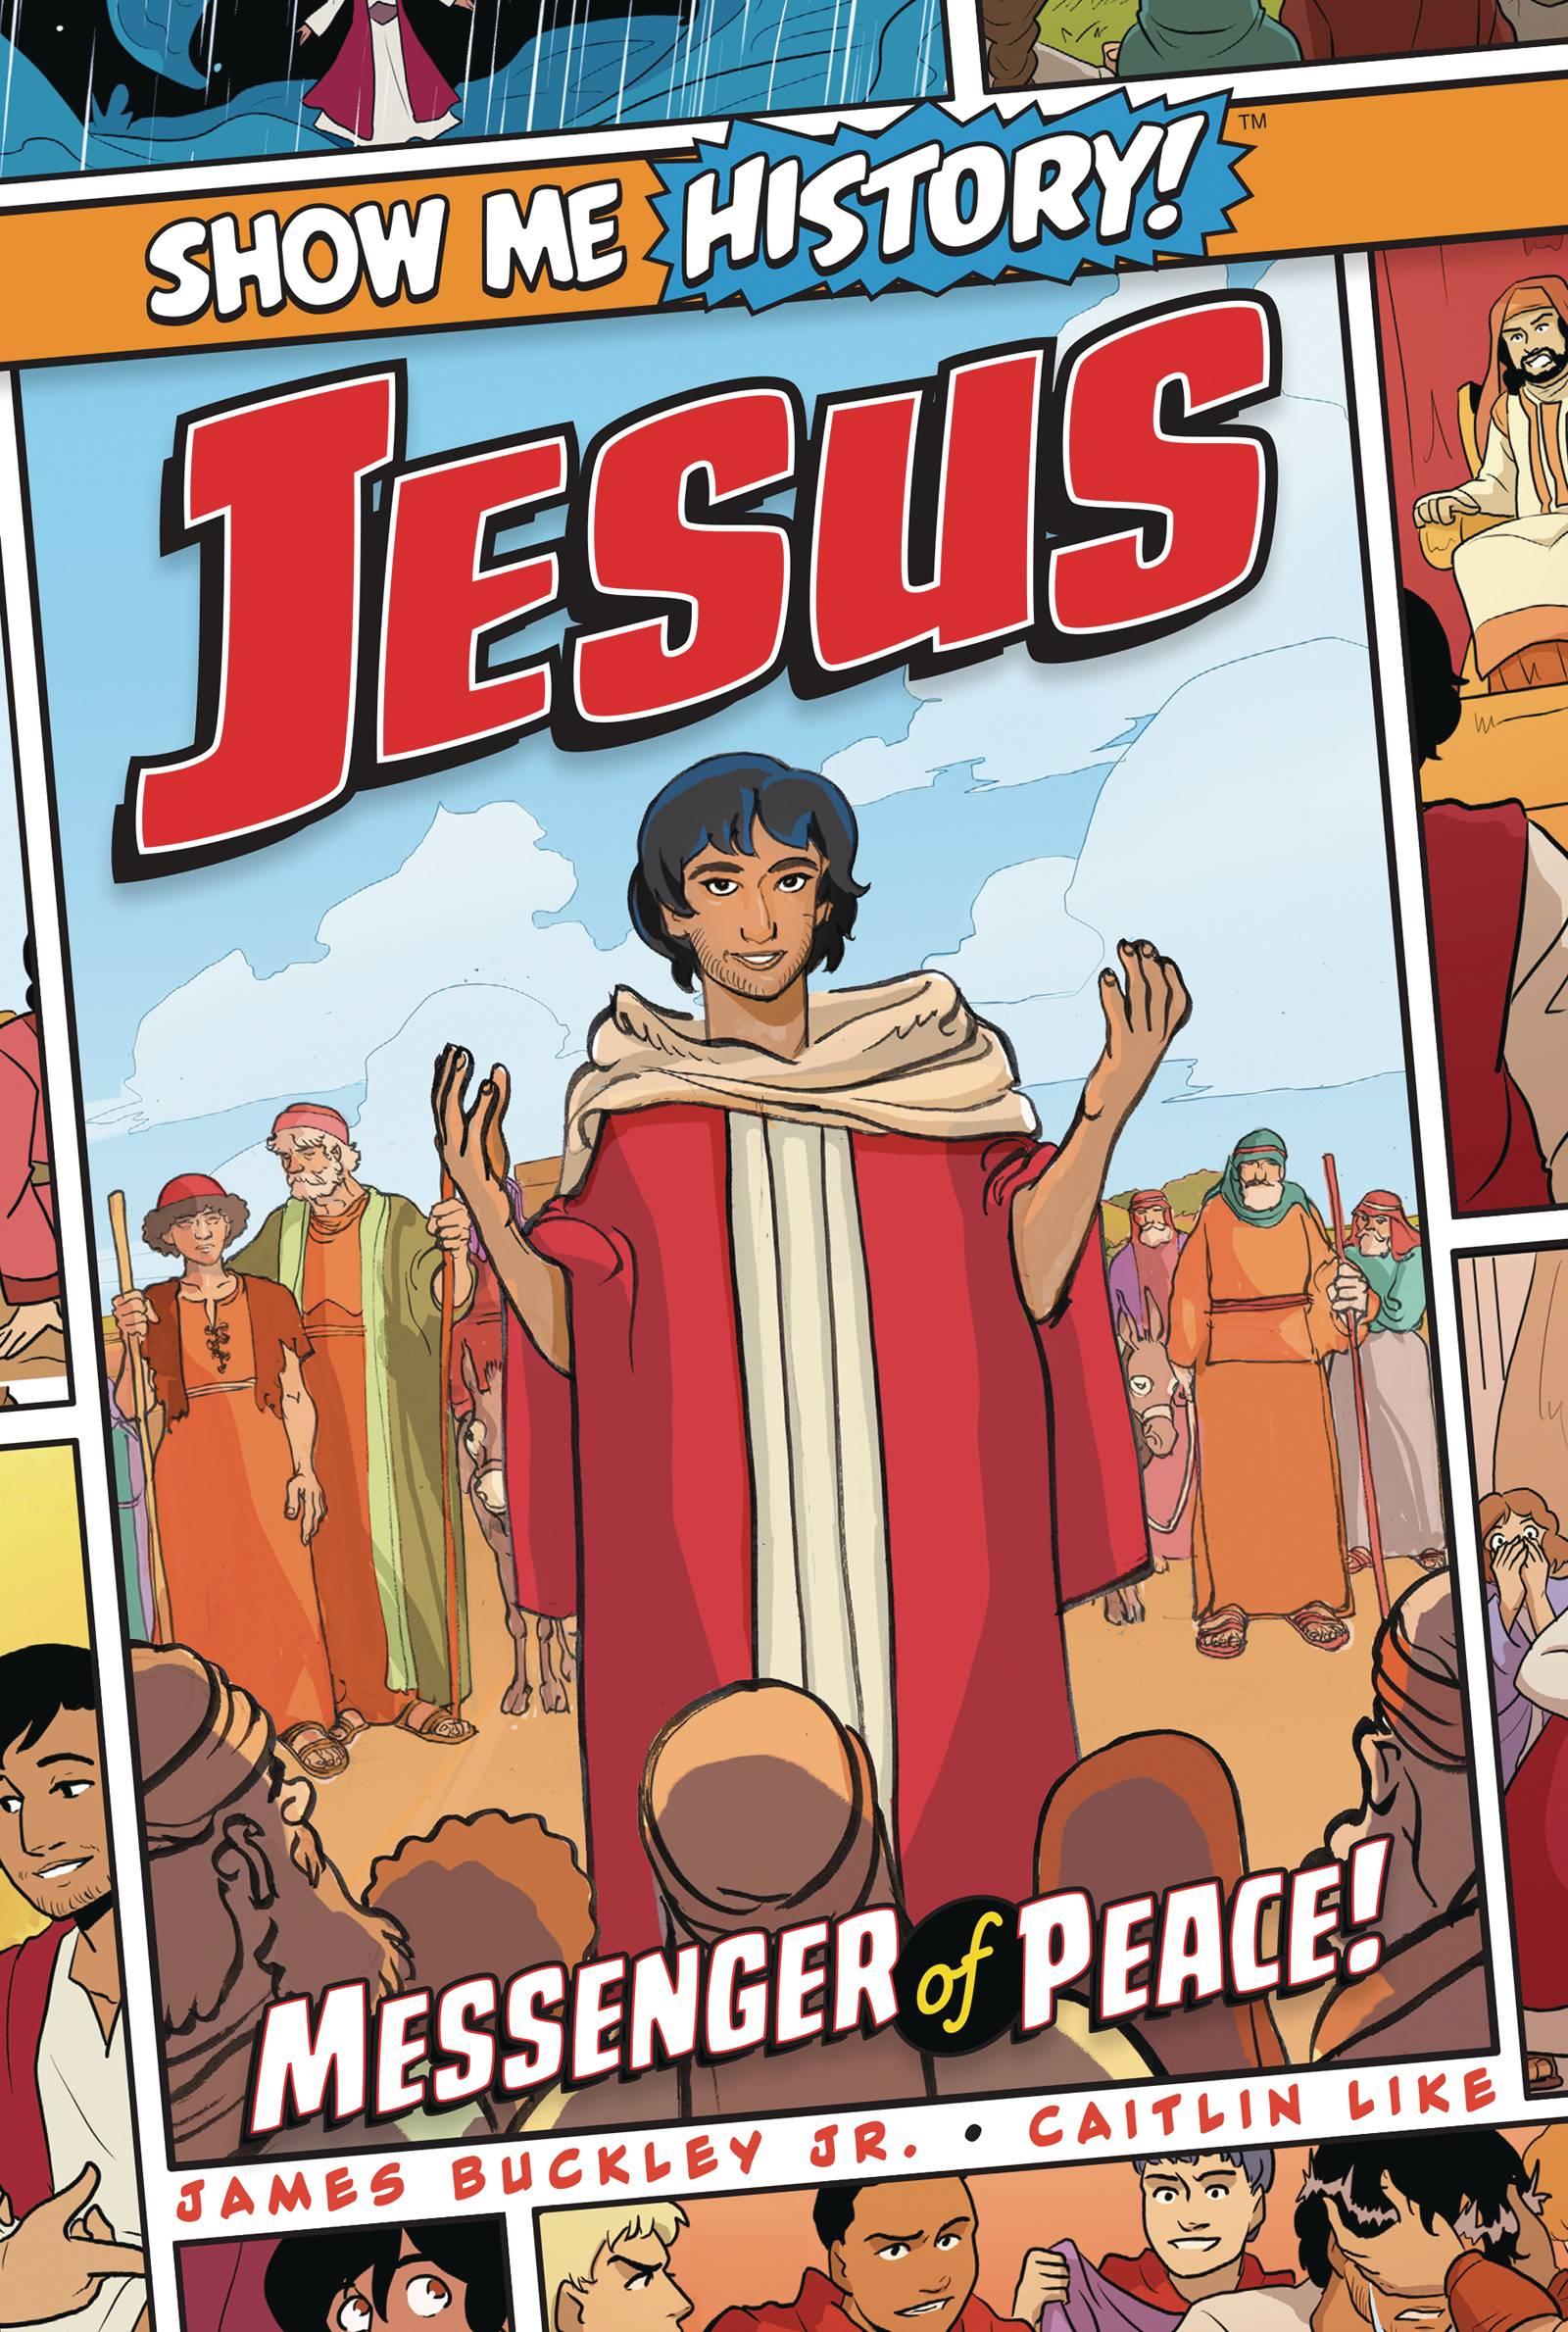 SHOW ME HISTORY TP JESUS MESSENGER OF PEACE